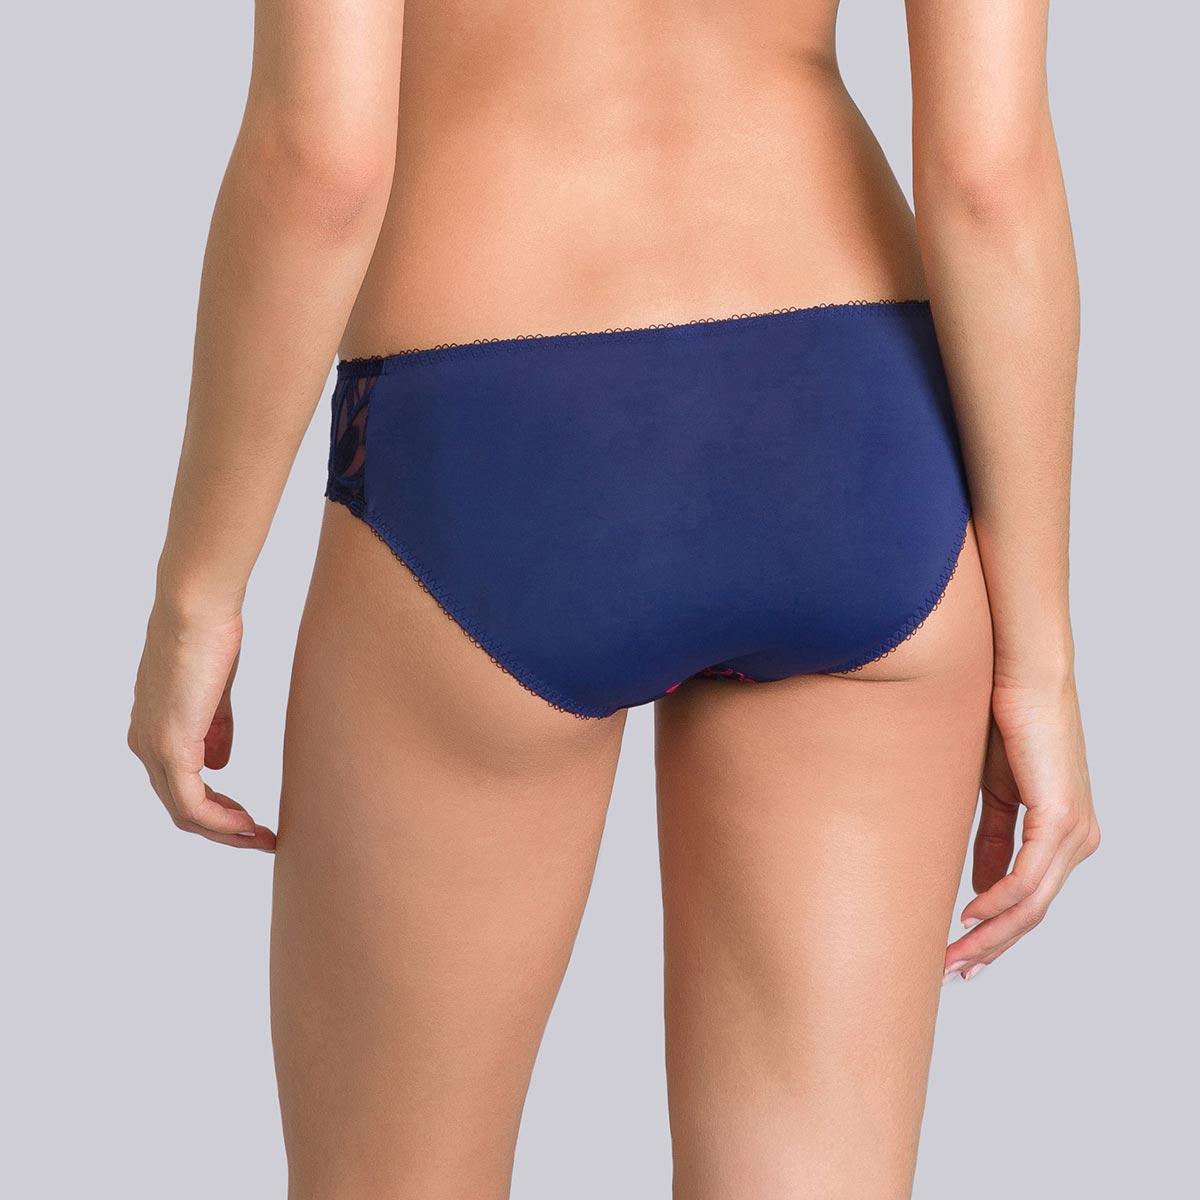 Culotte Mini bleue imprimé corail - Daily Elegance-PLAYTEX